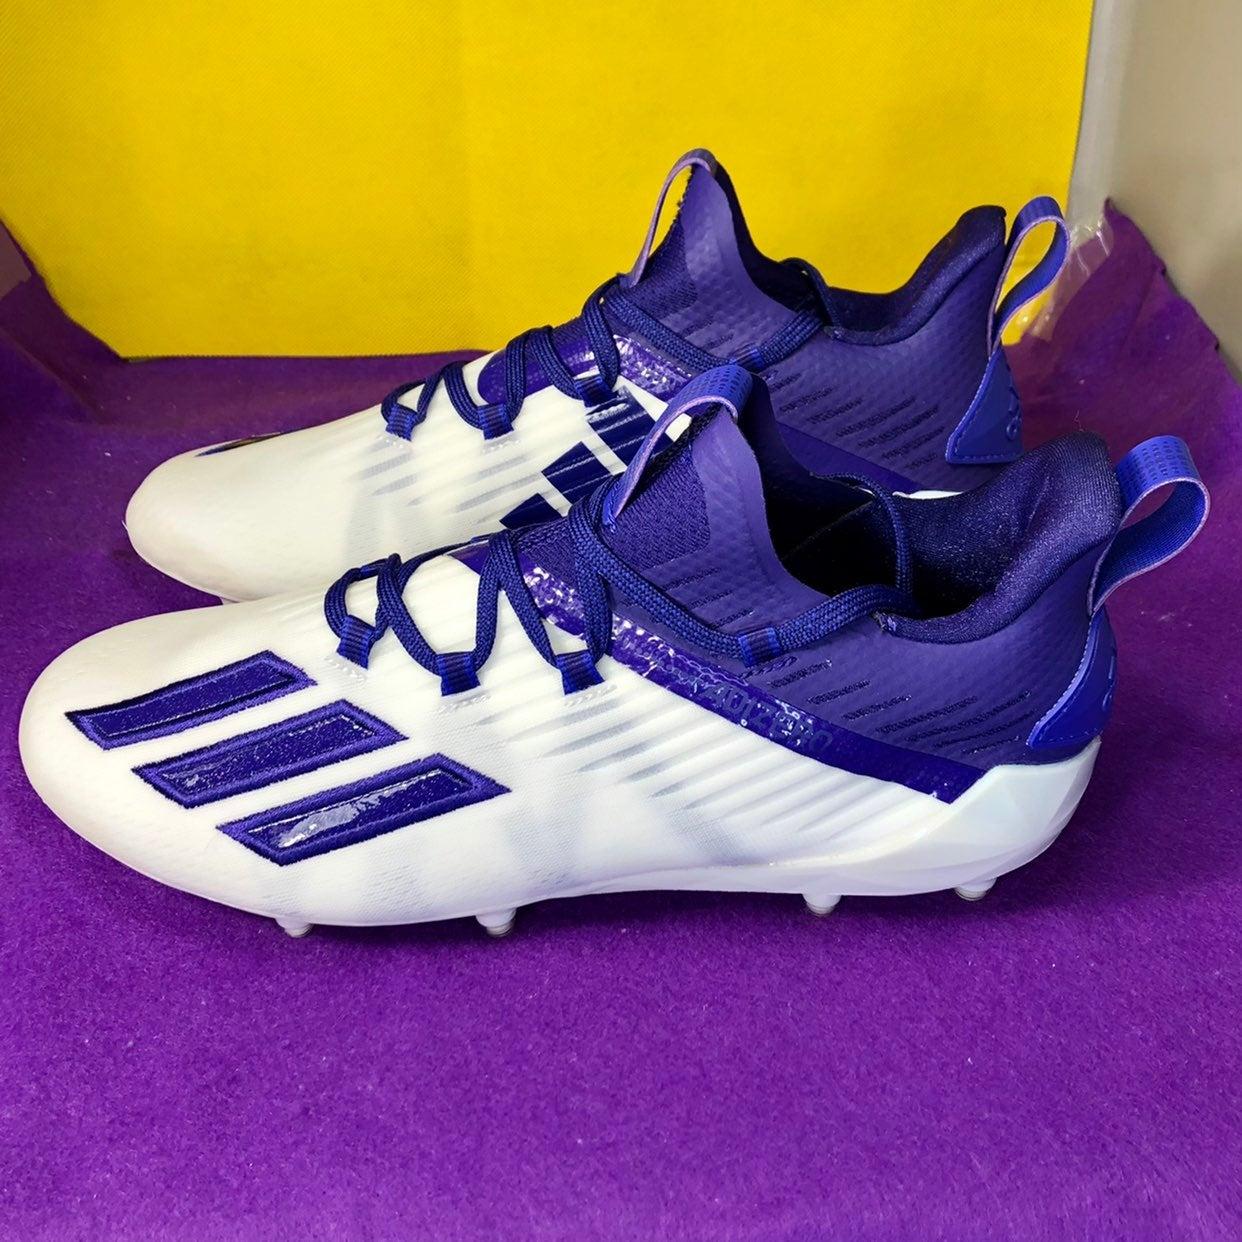 Adidas Men's Adizero Football Cleats 8.5